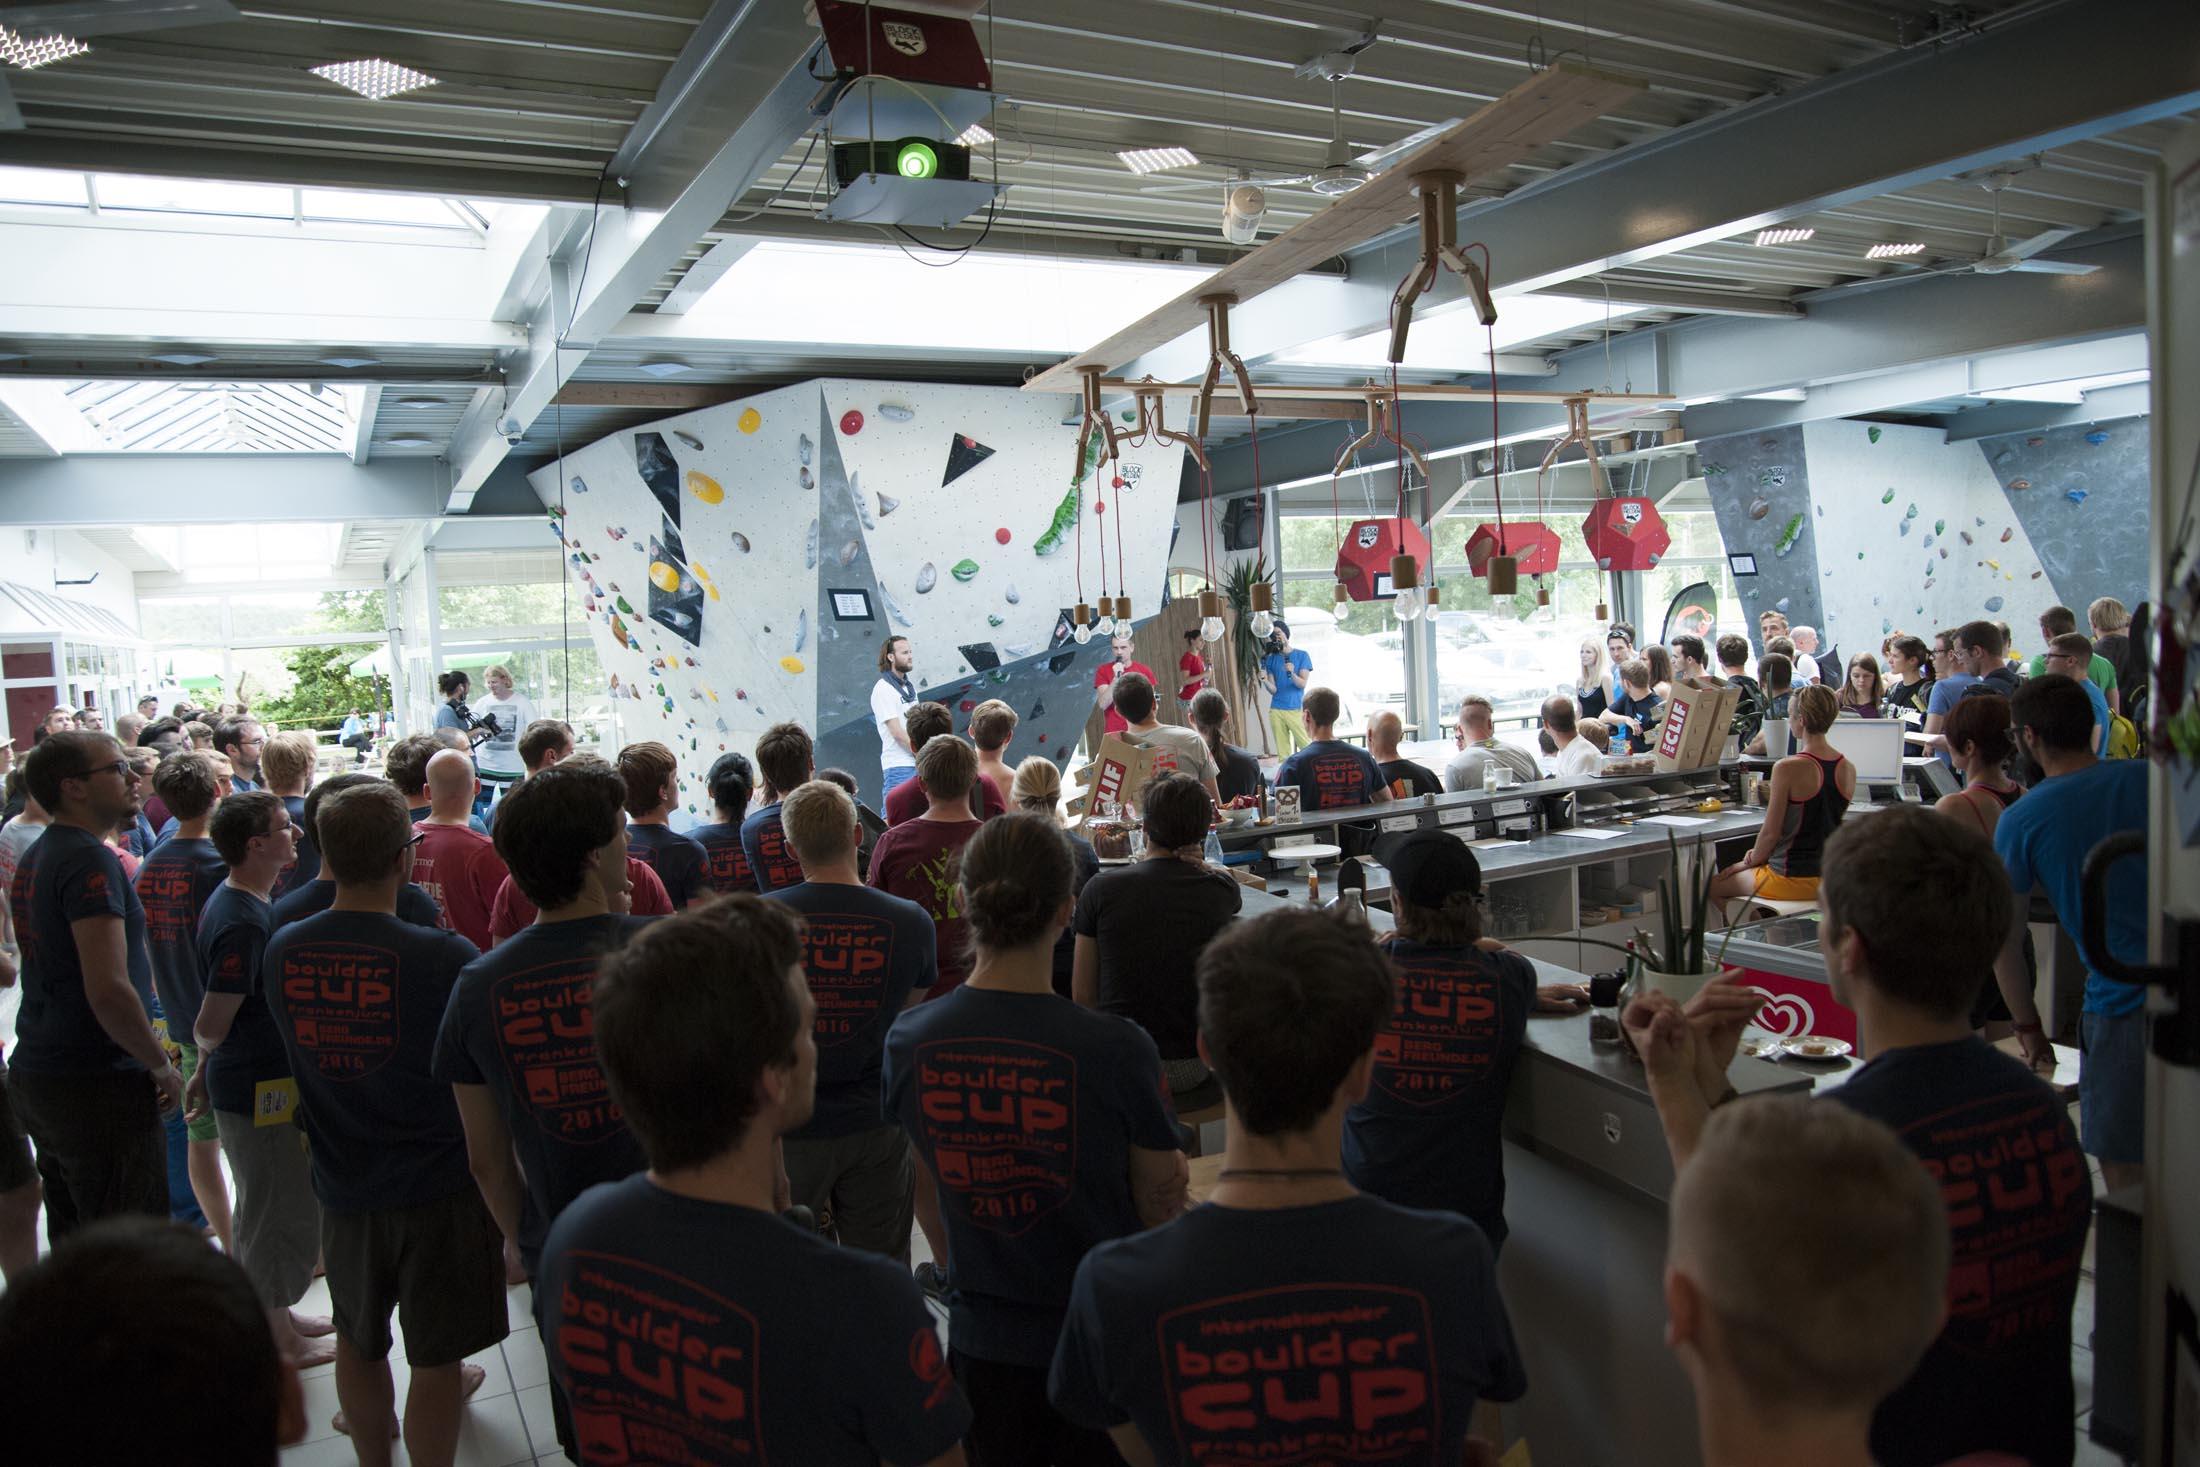 Registration internationaler bouldercup Frankenjura 2016, BLOCKHELDEN Erlangen, Mammut, Bergfreunde.de, Boulderwettkampf07092016095